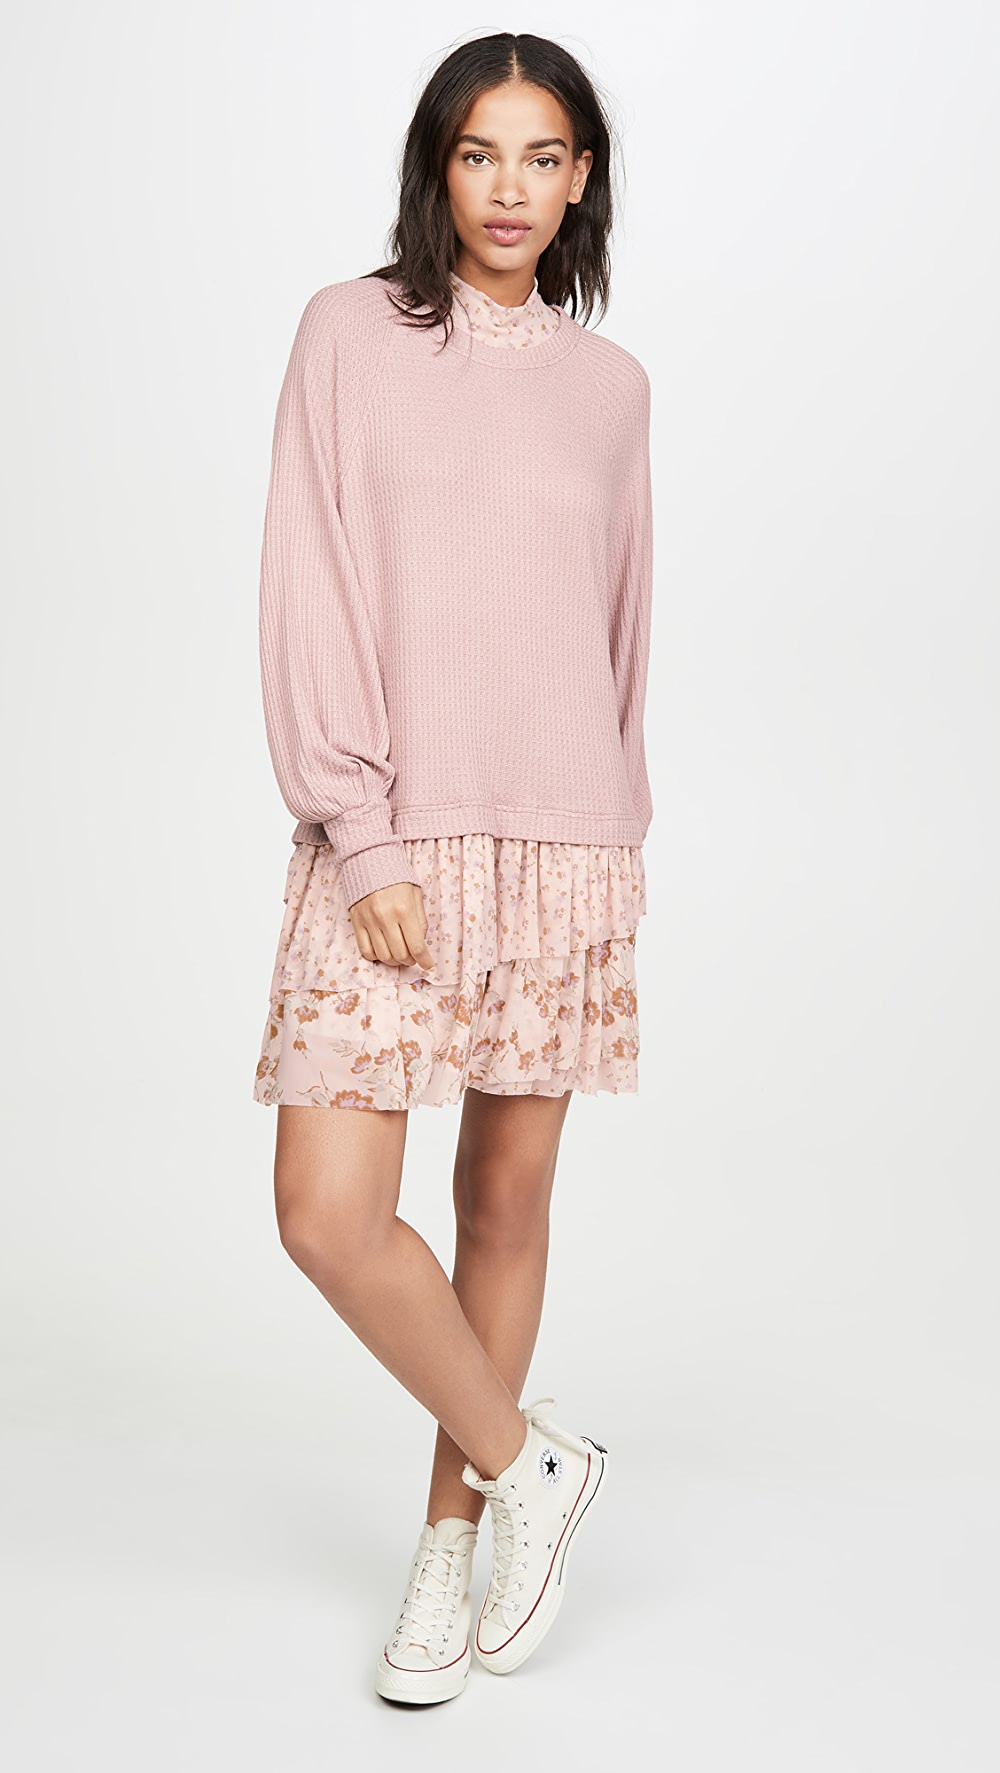 Combo Sweater Dress